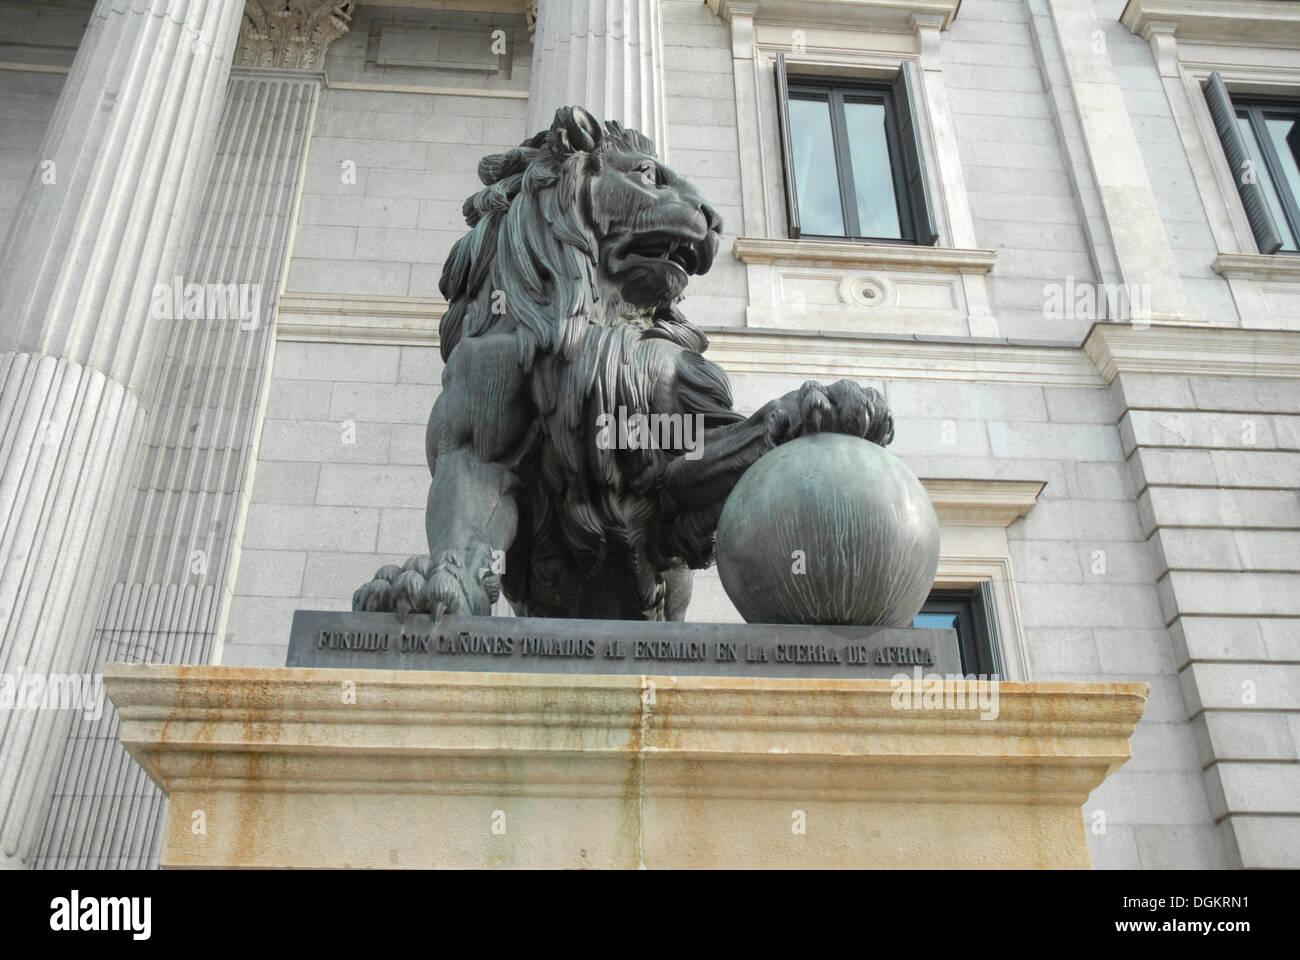 Lion in front of the Congress building, Congreso de los Diputados, Parliament Building, Madrid, Spain, Europe - Stock Image